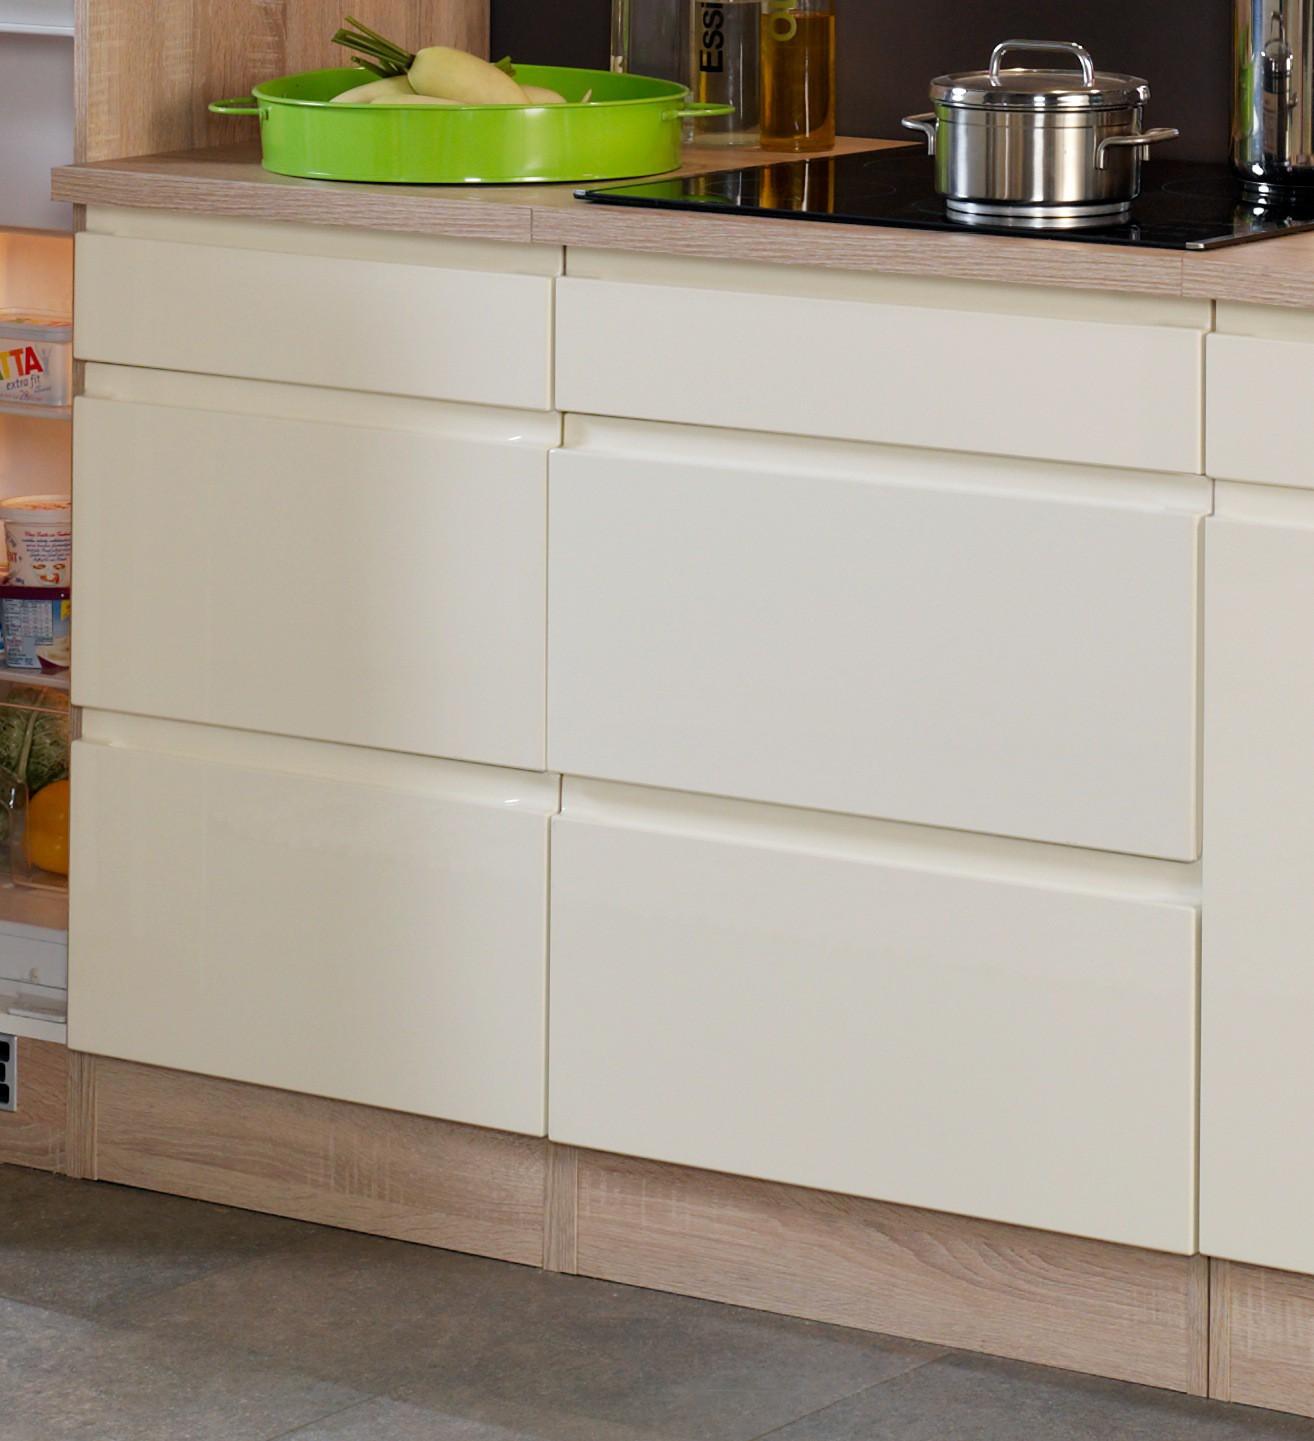 neu k chenzeile cardiff k chenblock 270cm hochglanz creme sonoma mit e ger ten ebay. Black Bedroom Furniture Sets. Home Design Ideas